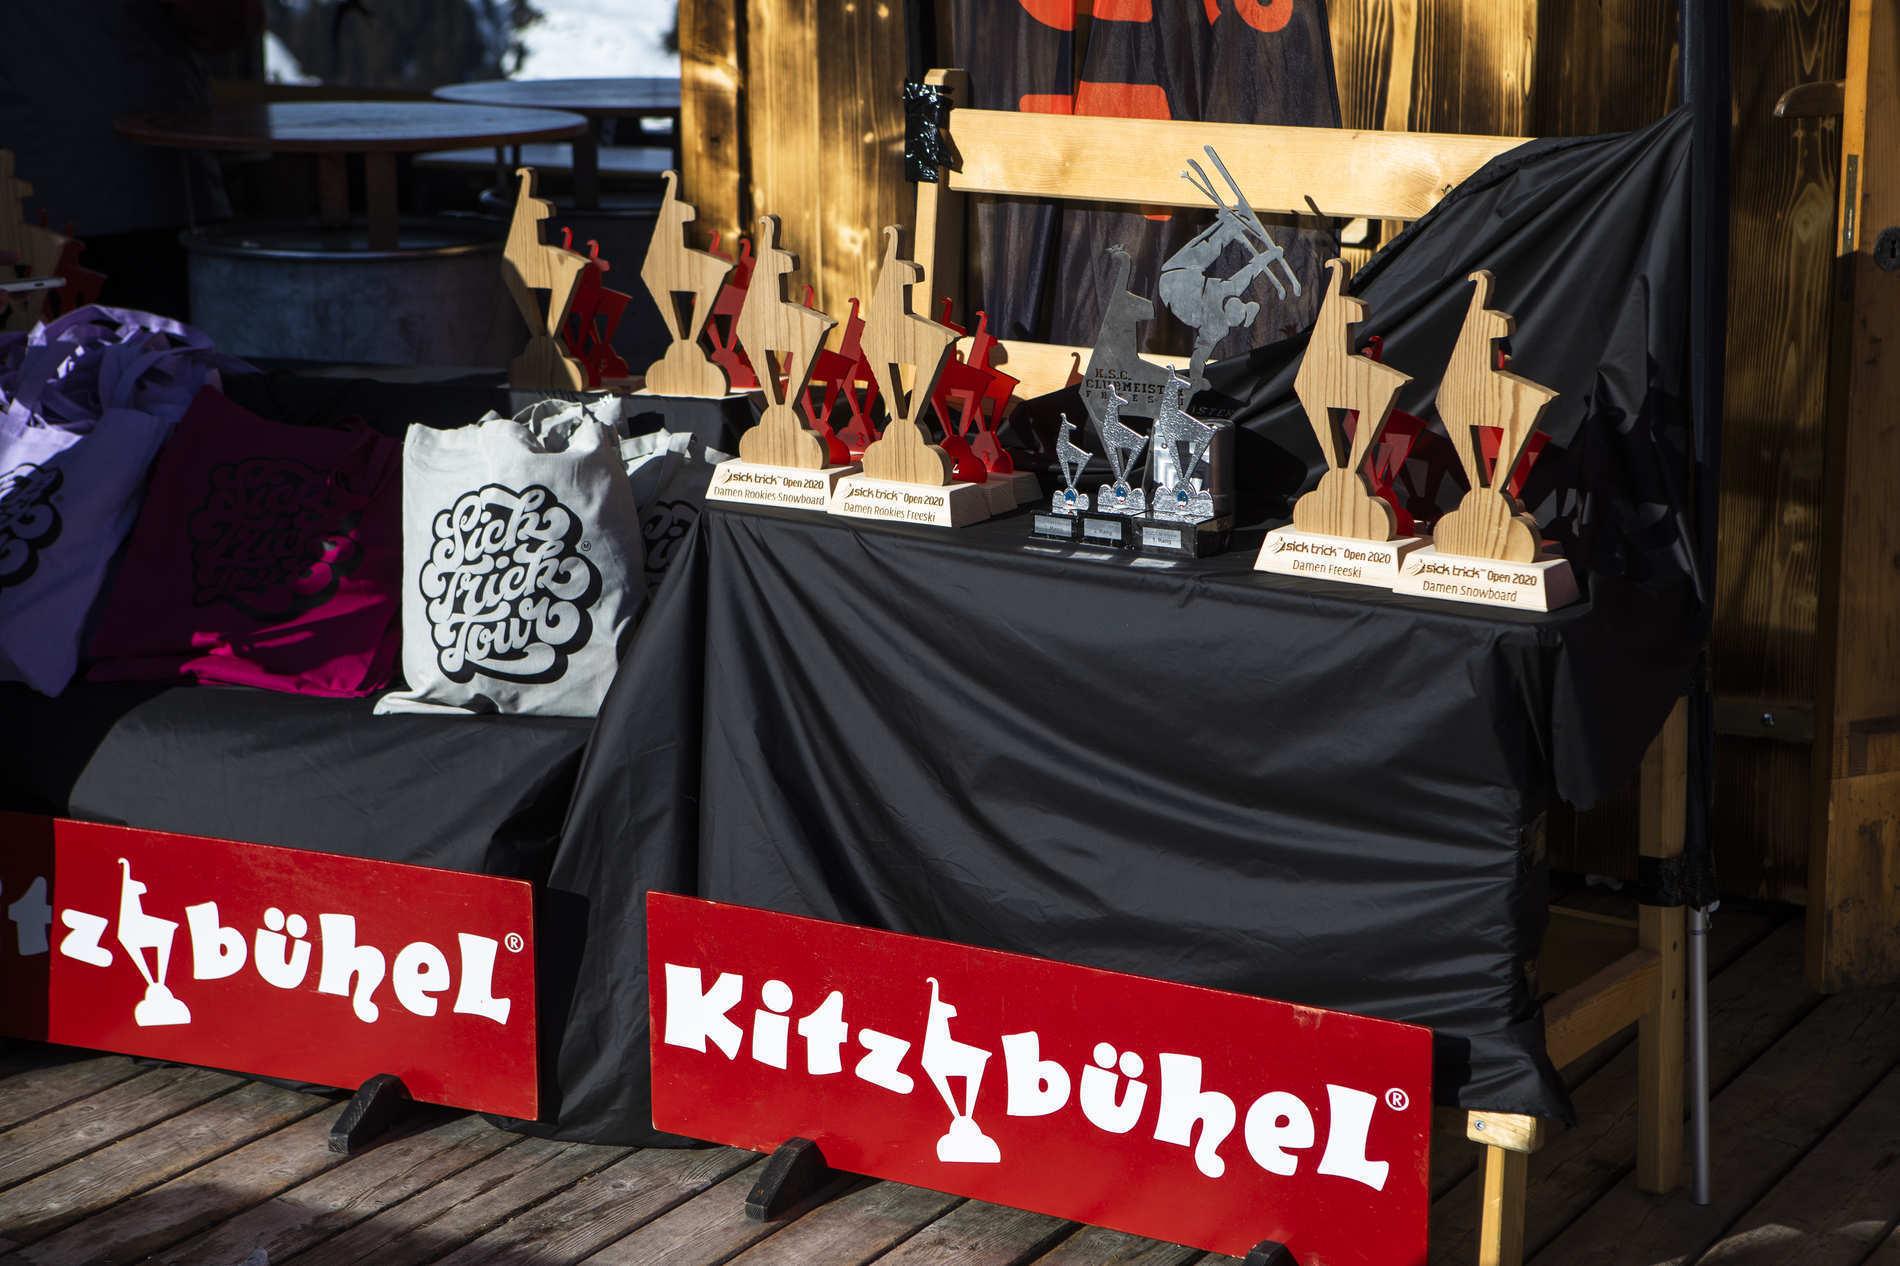 web kitzbuehel 22 02 2020 scenic roland haschka qparks 024